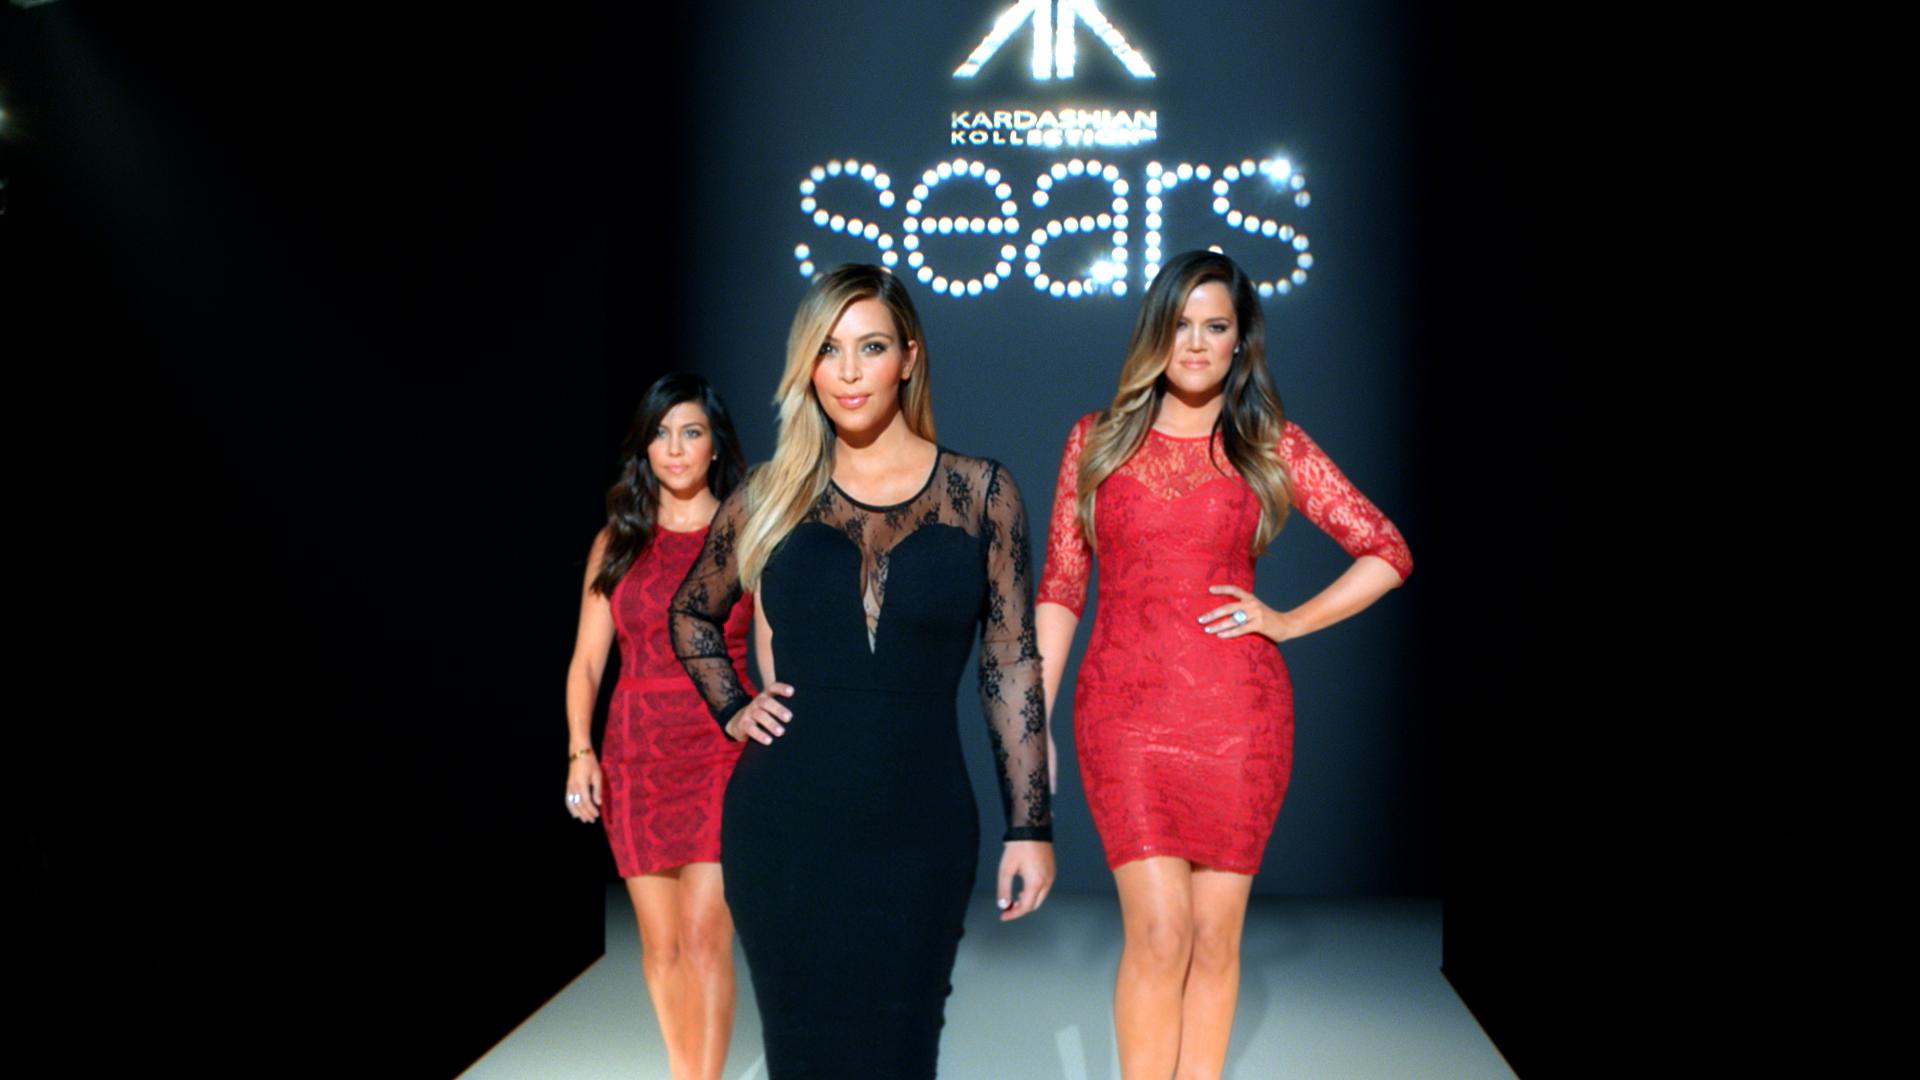 4002-Roth-Sears_KardashianKollection_AGENCY_30